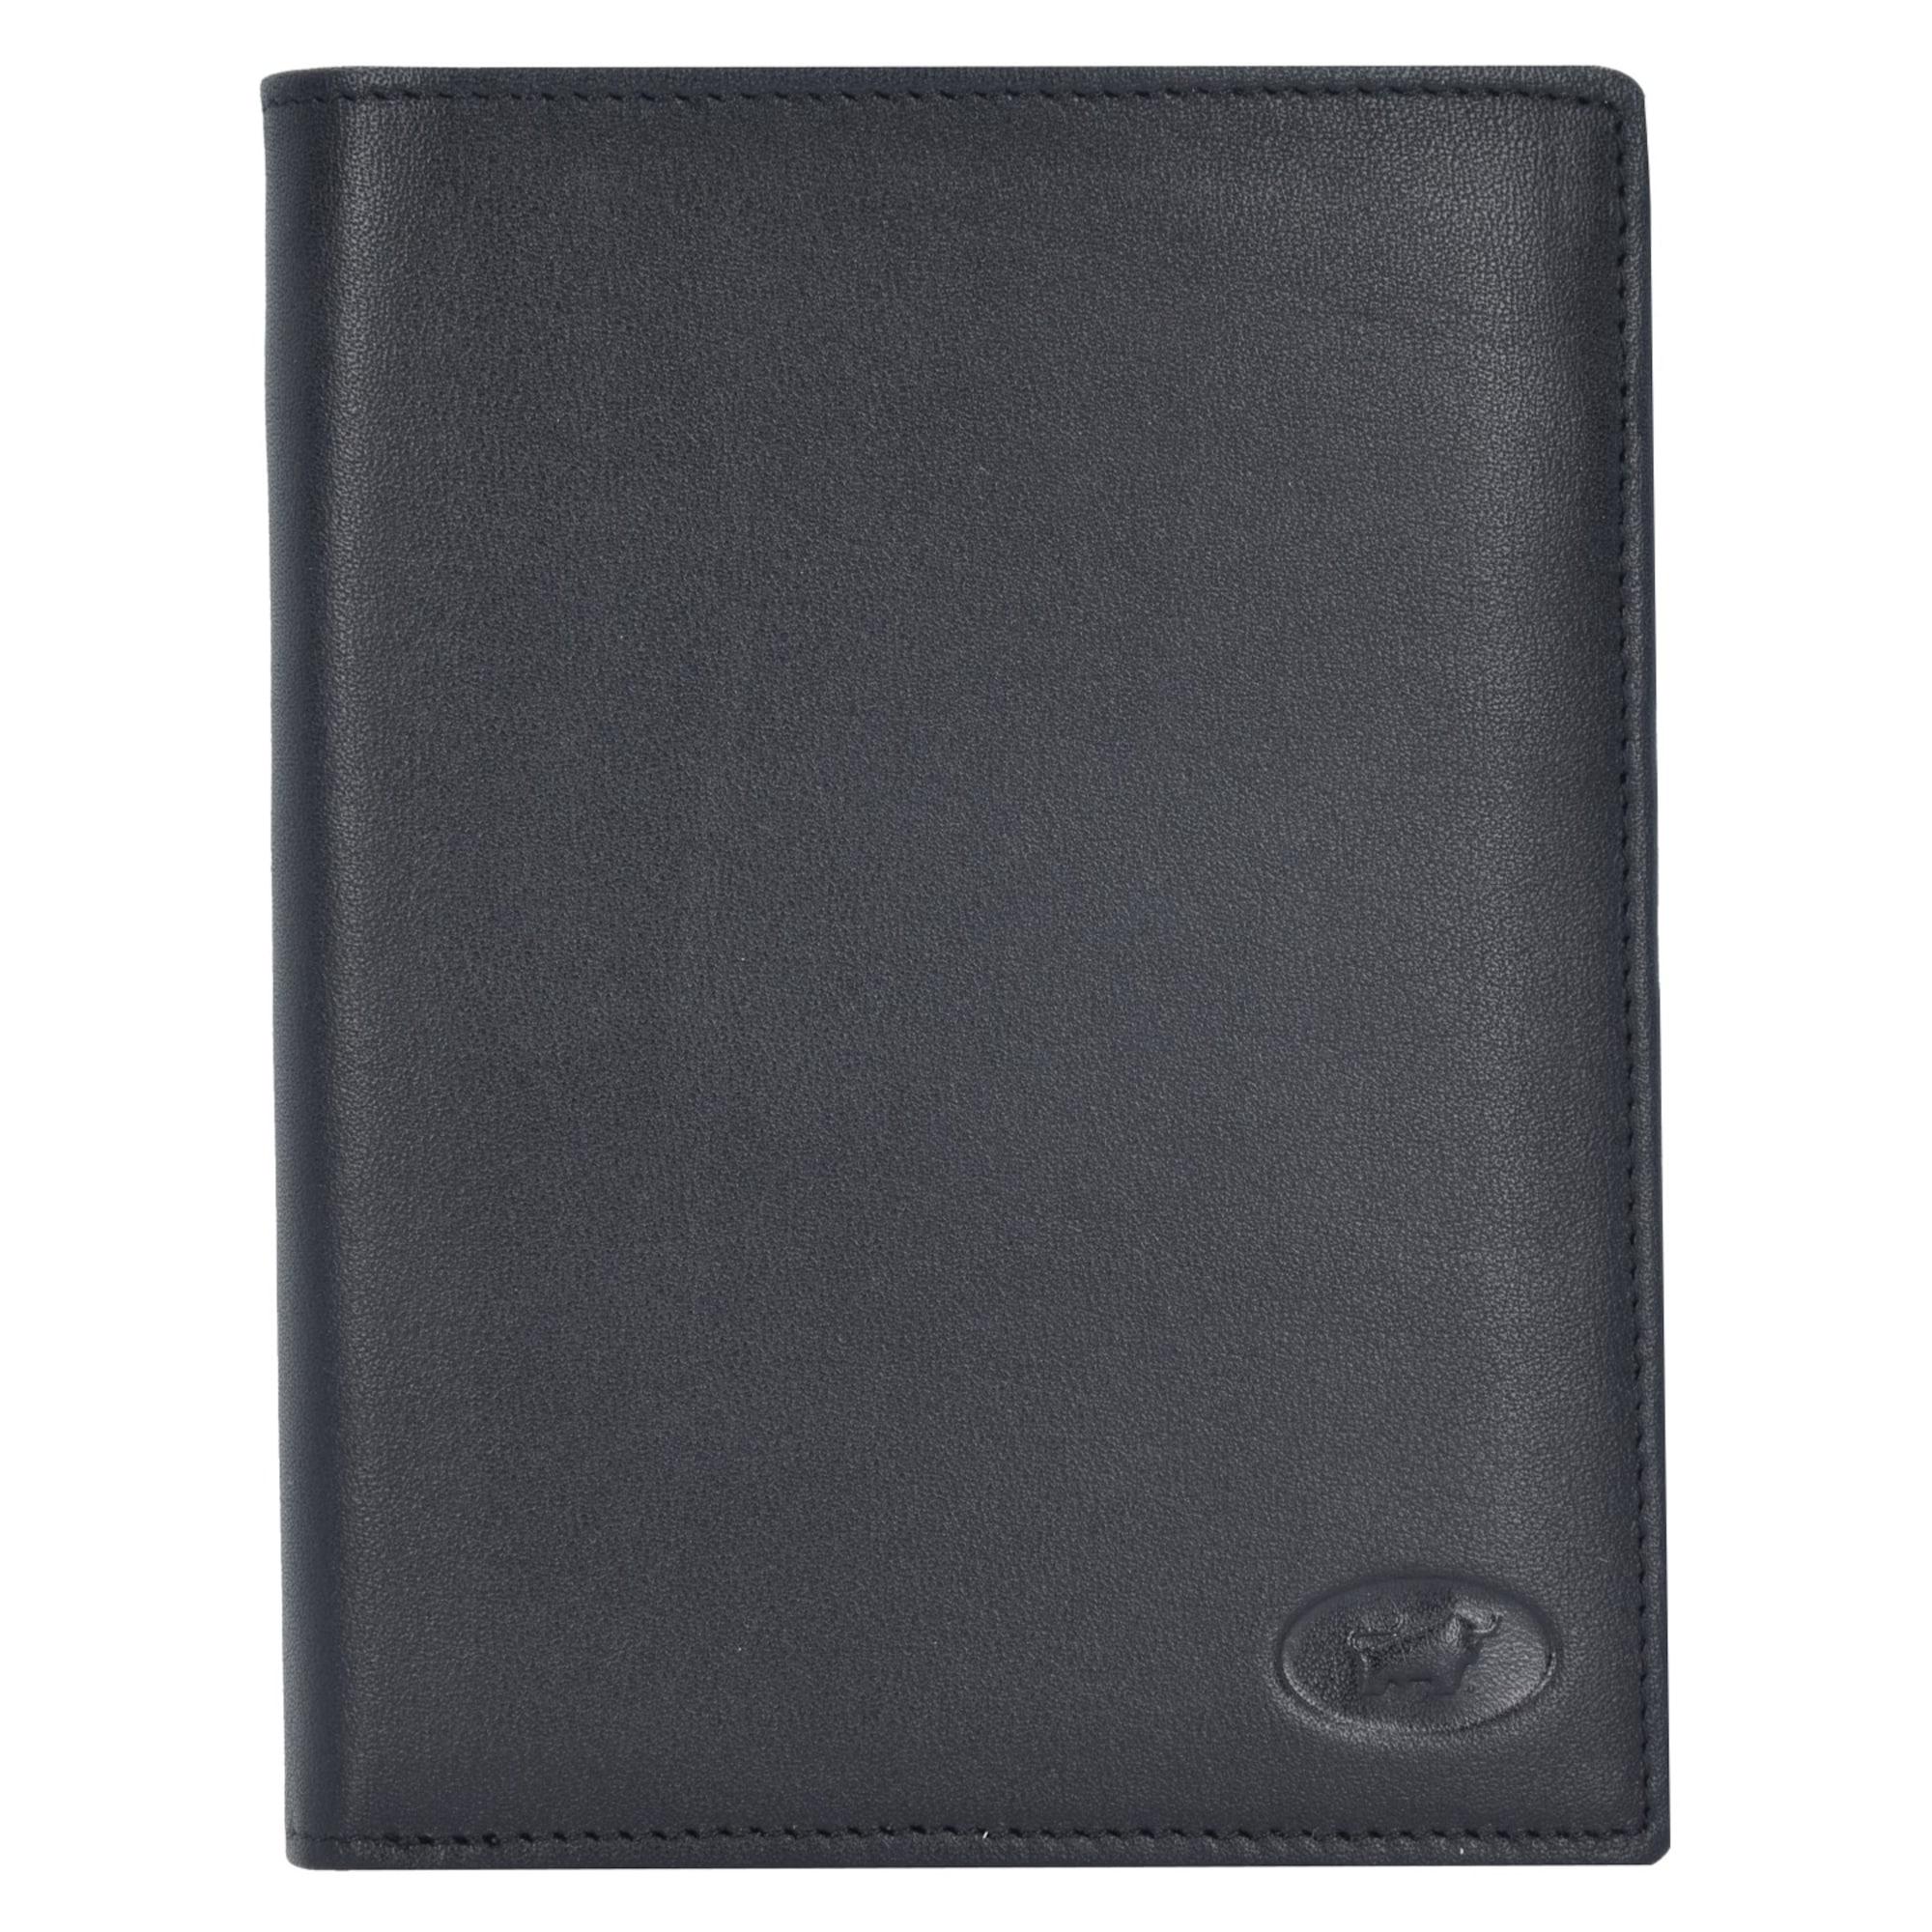 Geldbörse   Accessoires > Portemonnaies   Braun Büffel